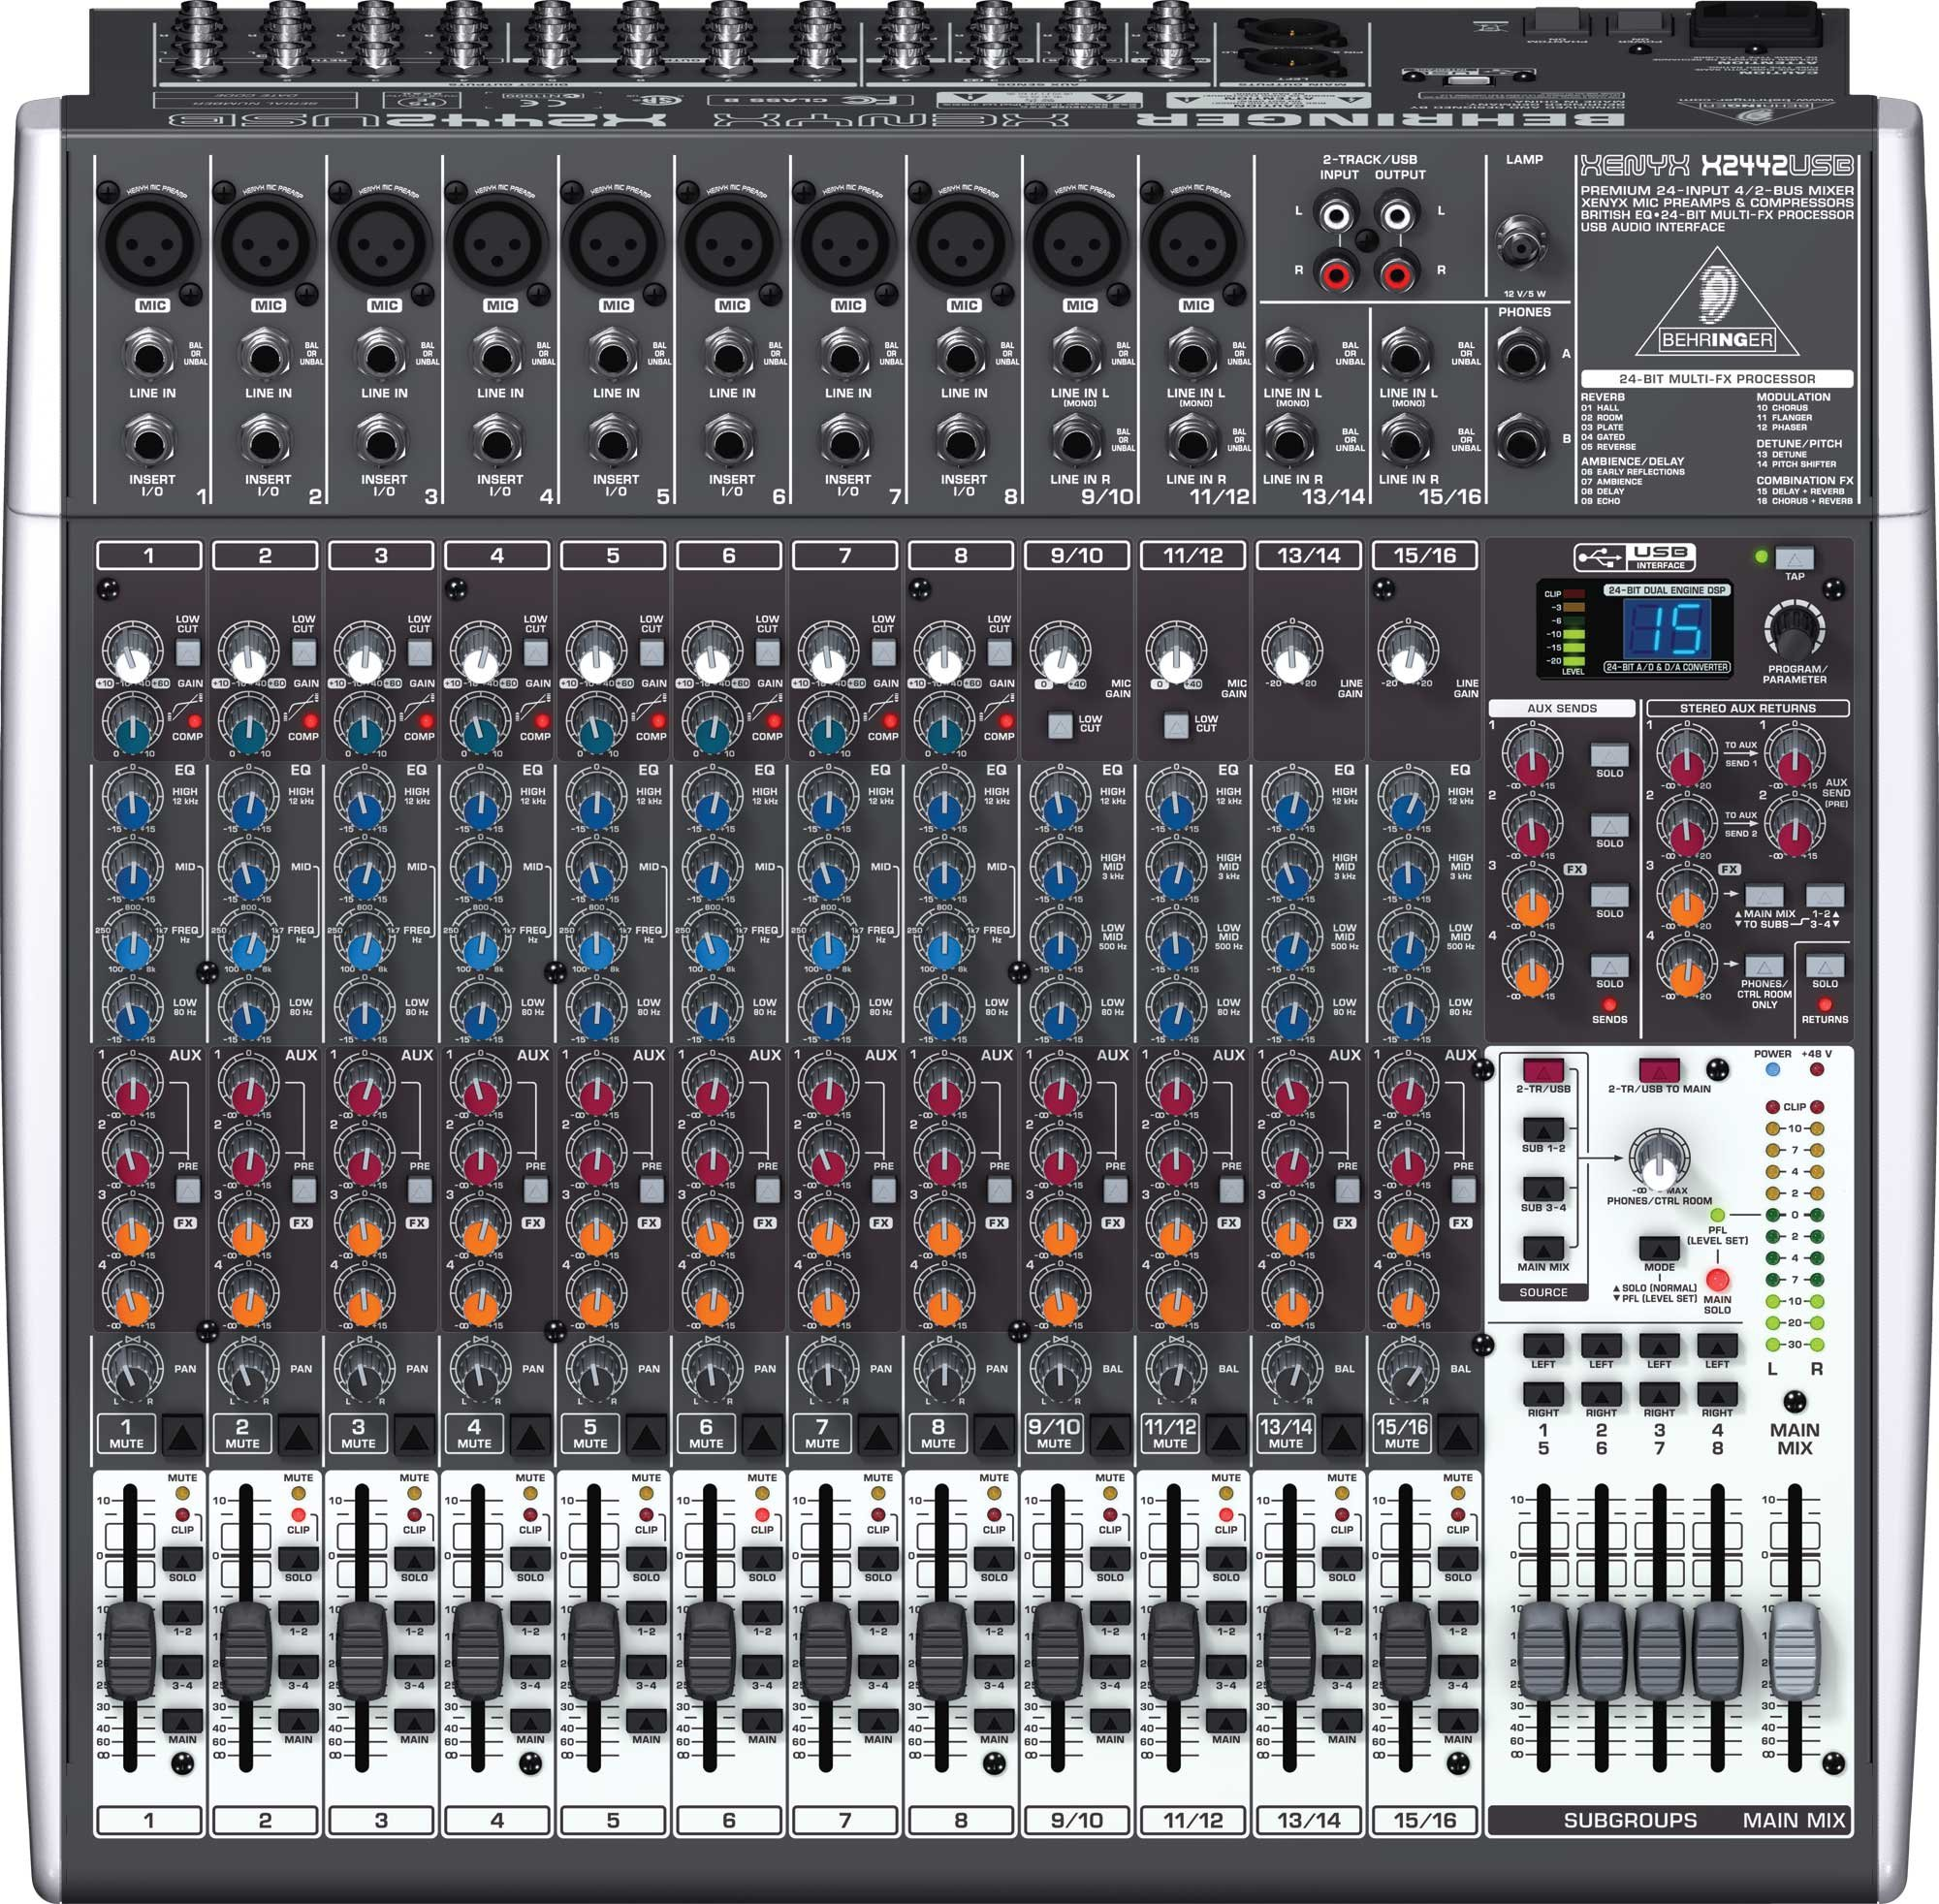 Mixer, 24 Input, 4/2 Bus, USB, energyXT2.5 Software, 24-bit Multi-FX Processor